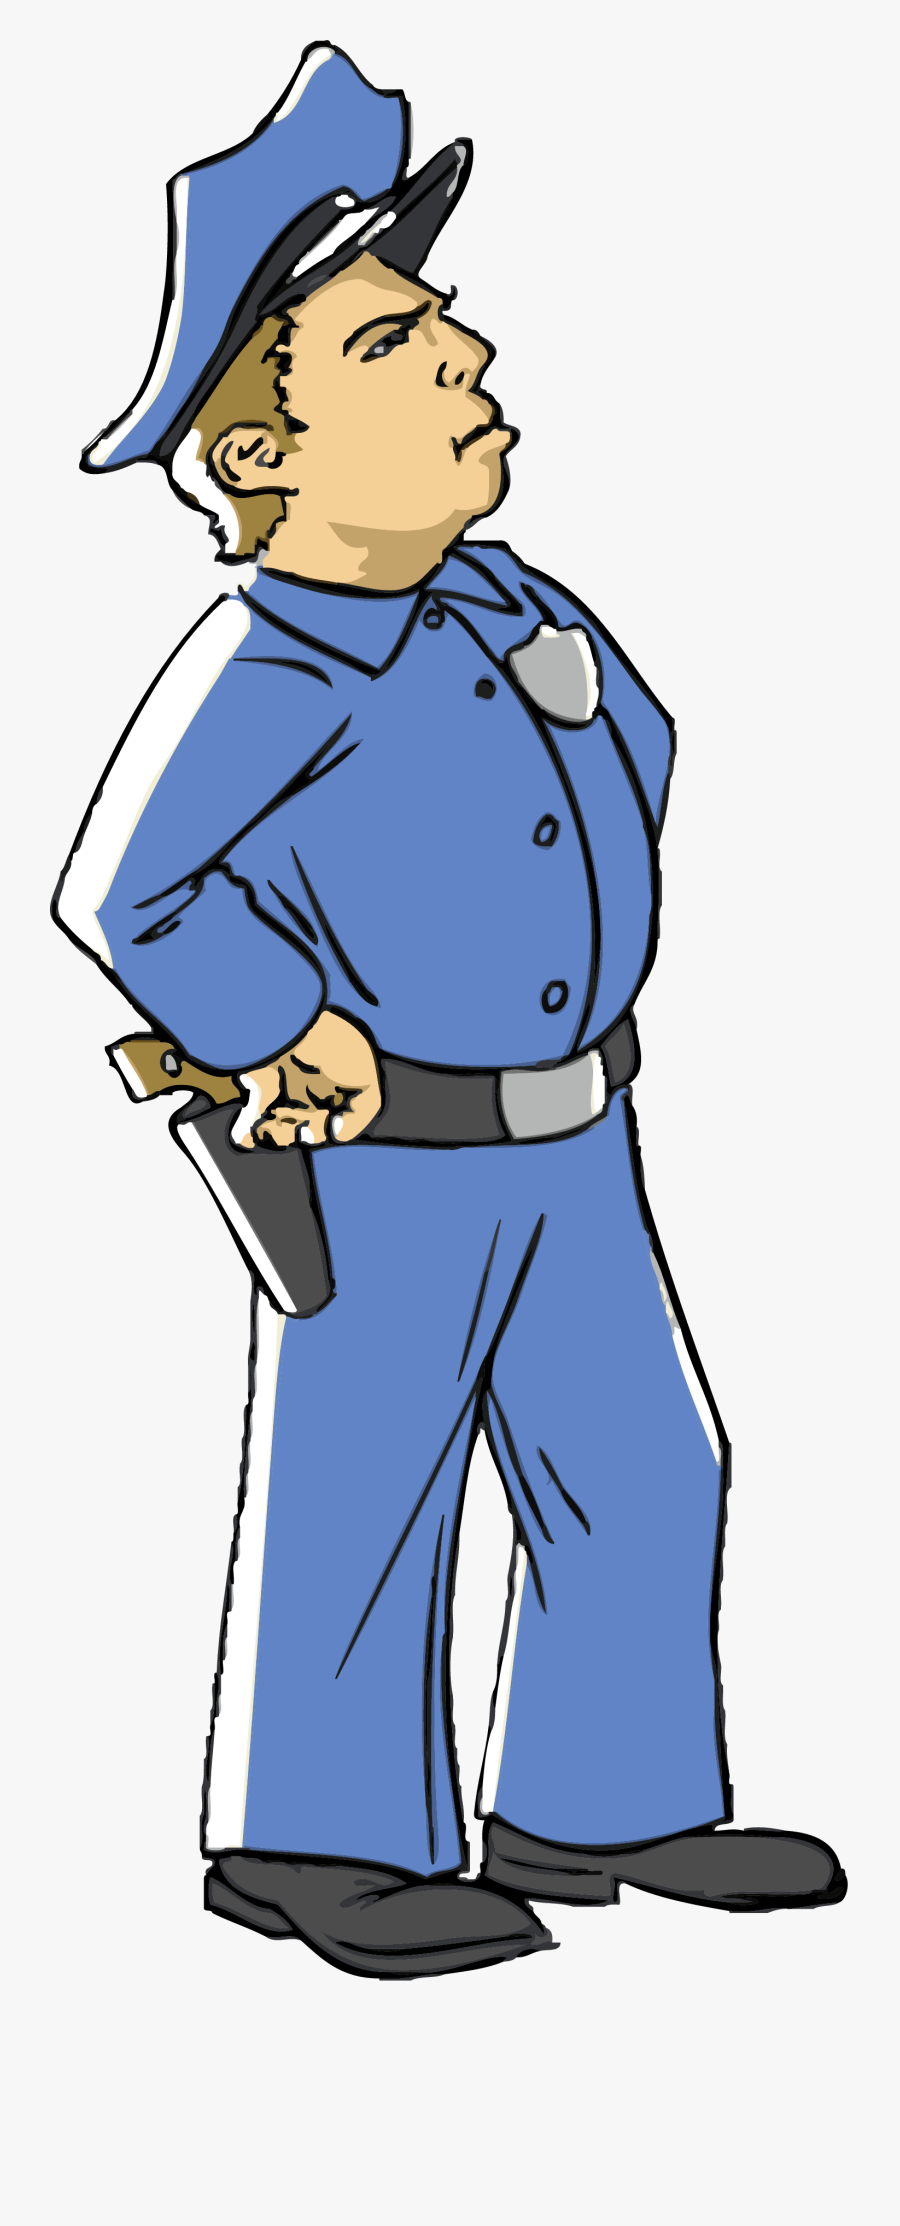 Transparent Knocking On Door Clipart - Police Officer Clip Art, Transparent Clipart